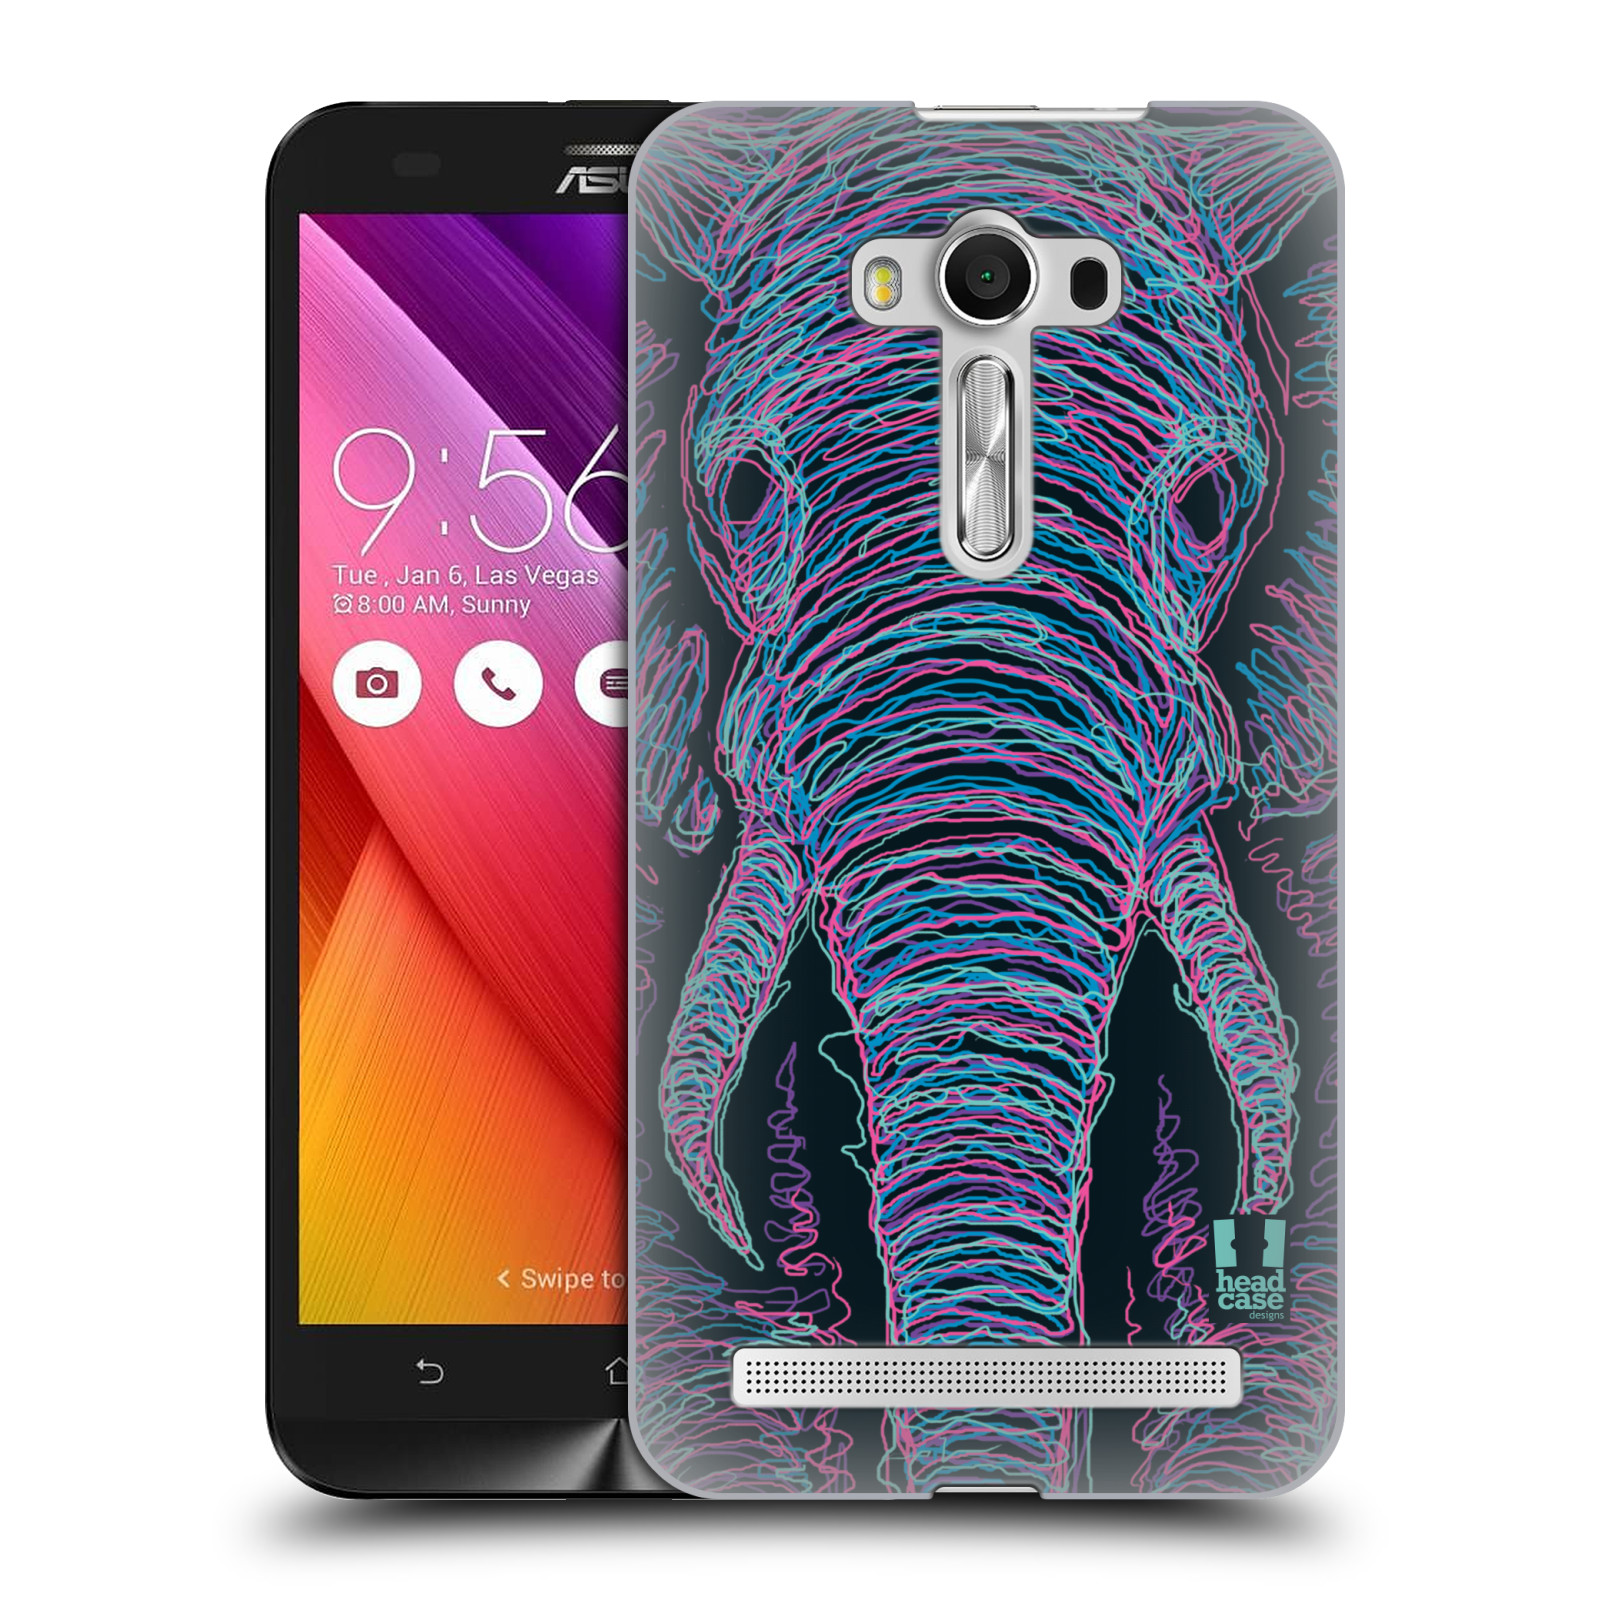 HEAD CASE plastový obal na mobil Asus Zenfone 2 LASER (5,5 displej ZE550KL) vzor zvíře čmáranice slon